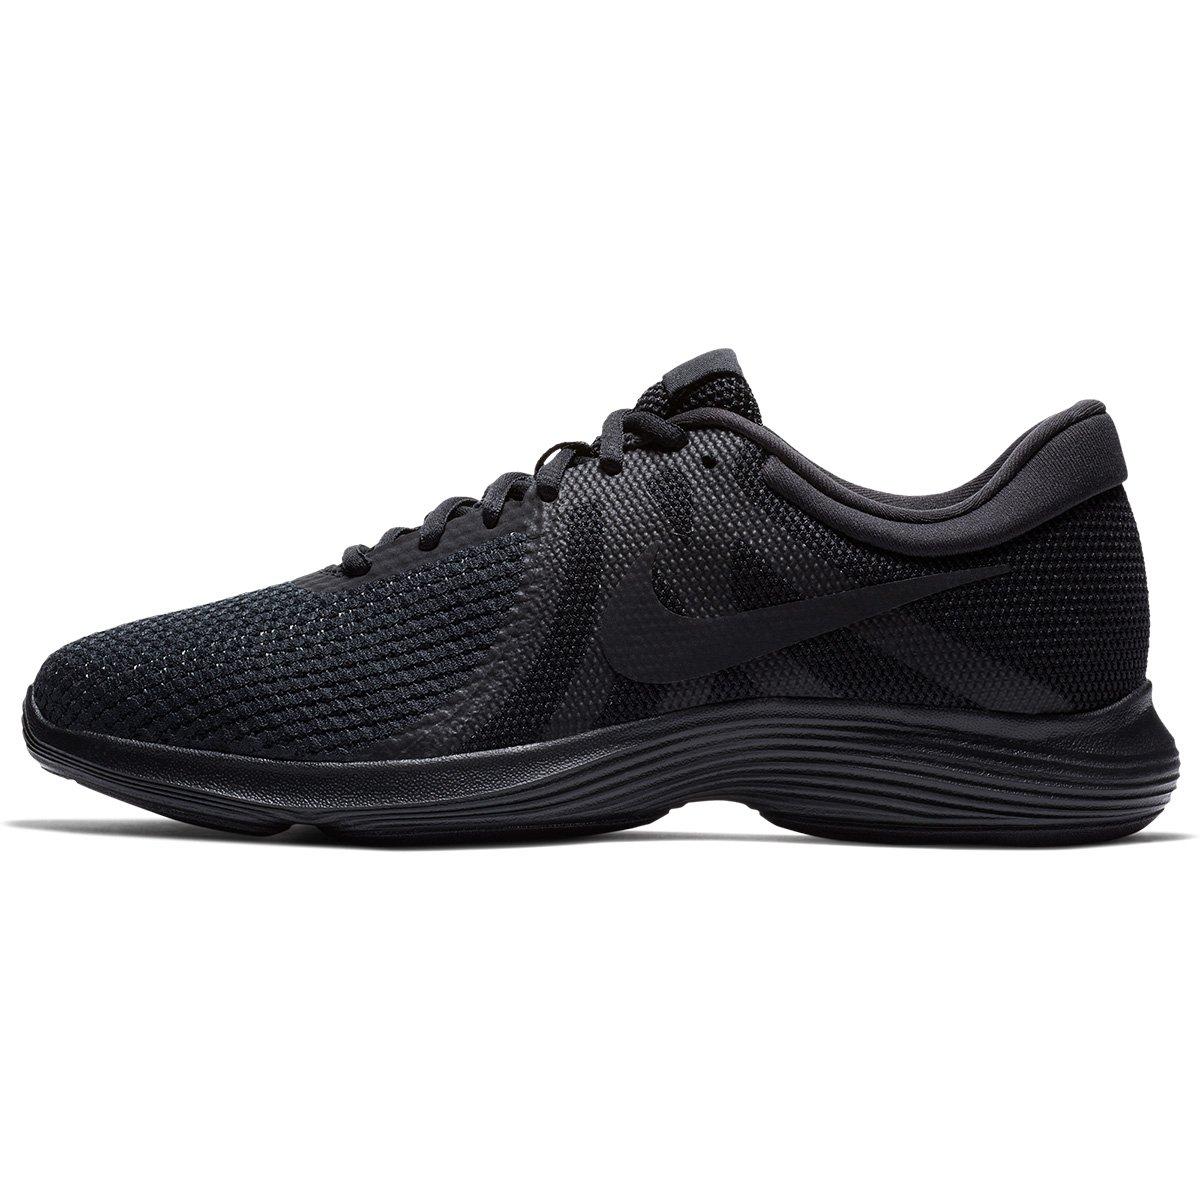 Tênis Nike Revolution 4 Masculino - Preto - Compre Agora  76658ecd2860d